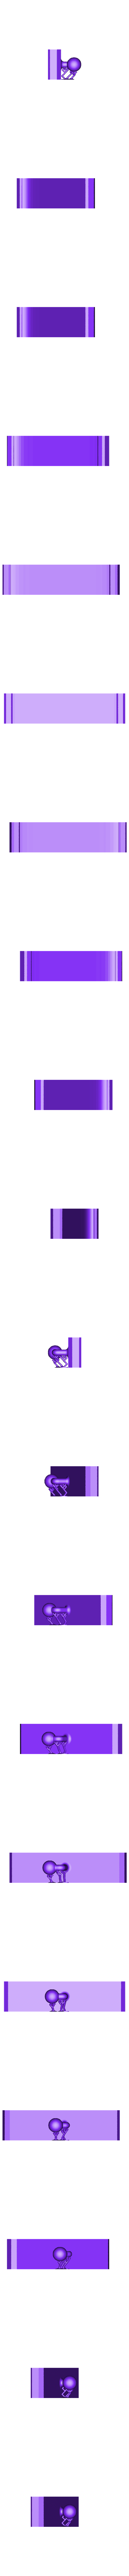 NEX7_Mount_Horizontal_SUPPORTED.STL Download free STL file IKEA TERTIAL lamp Nexus 7 (2013) mount • 3D printer model, Werthrante